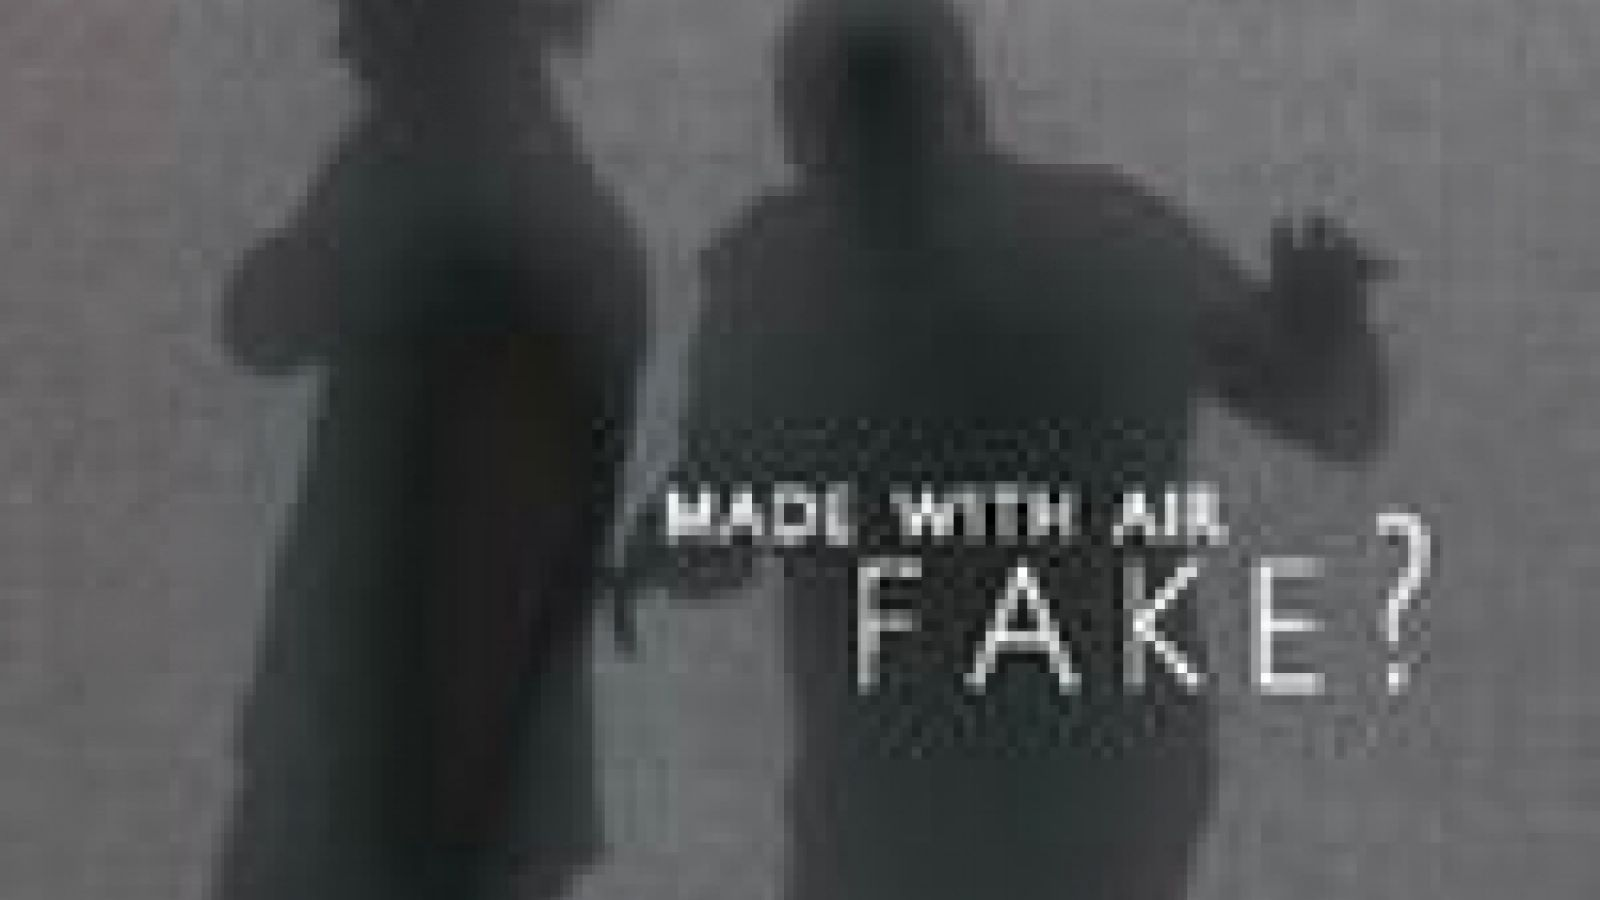 FAKE? Air © JaME